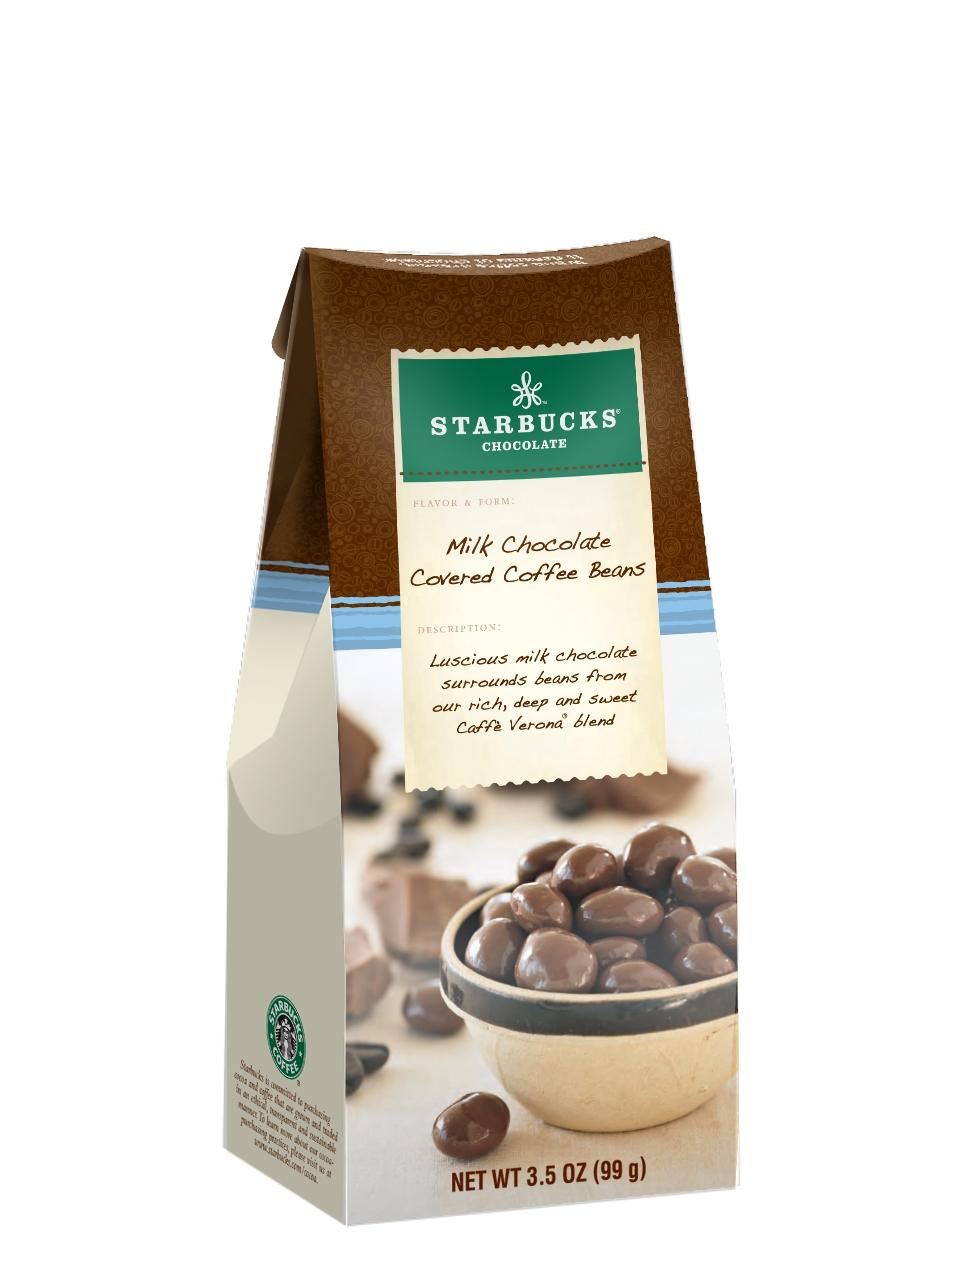 New Starbucks 174 Chocolate Debuts Blending Premium Artisan